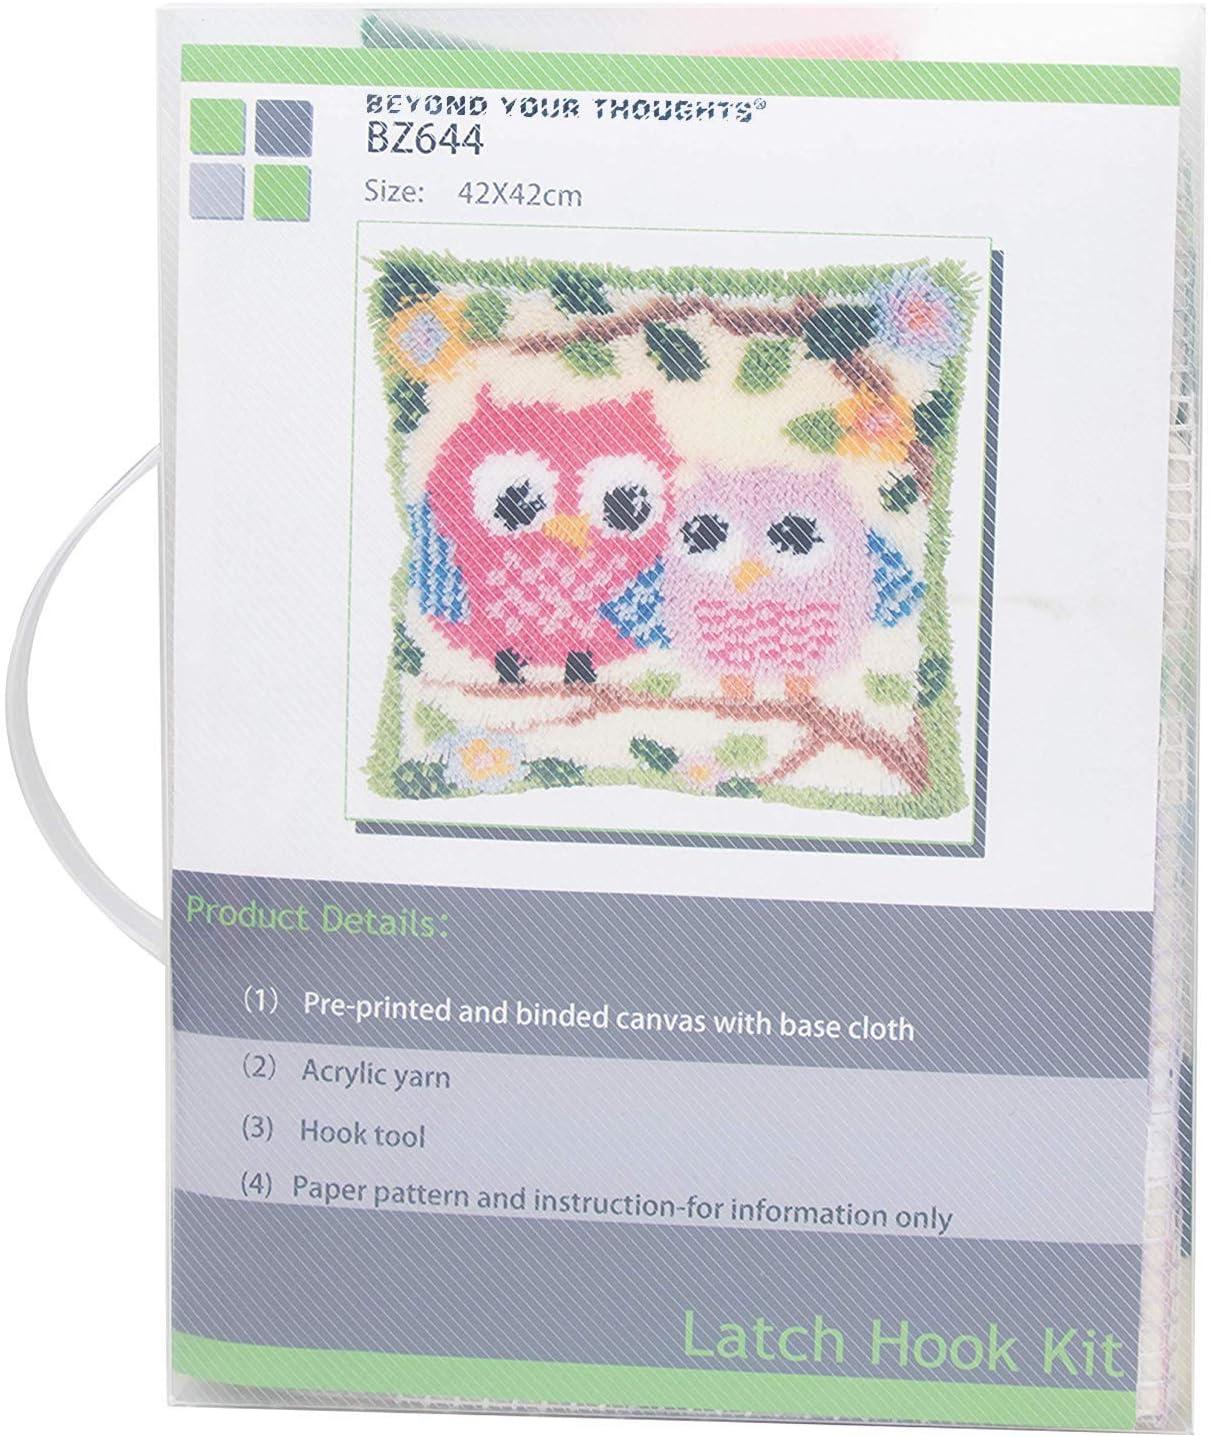 Flower /& Bird Pattern Latch Hook kit Pillow Making Kit Includes Basic Tool